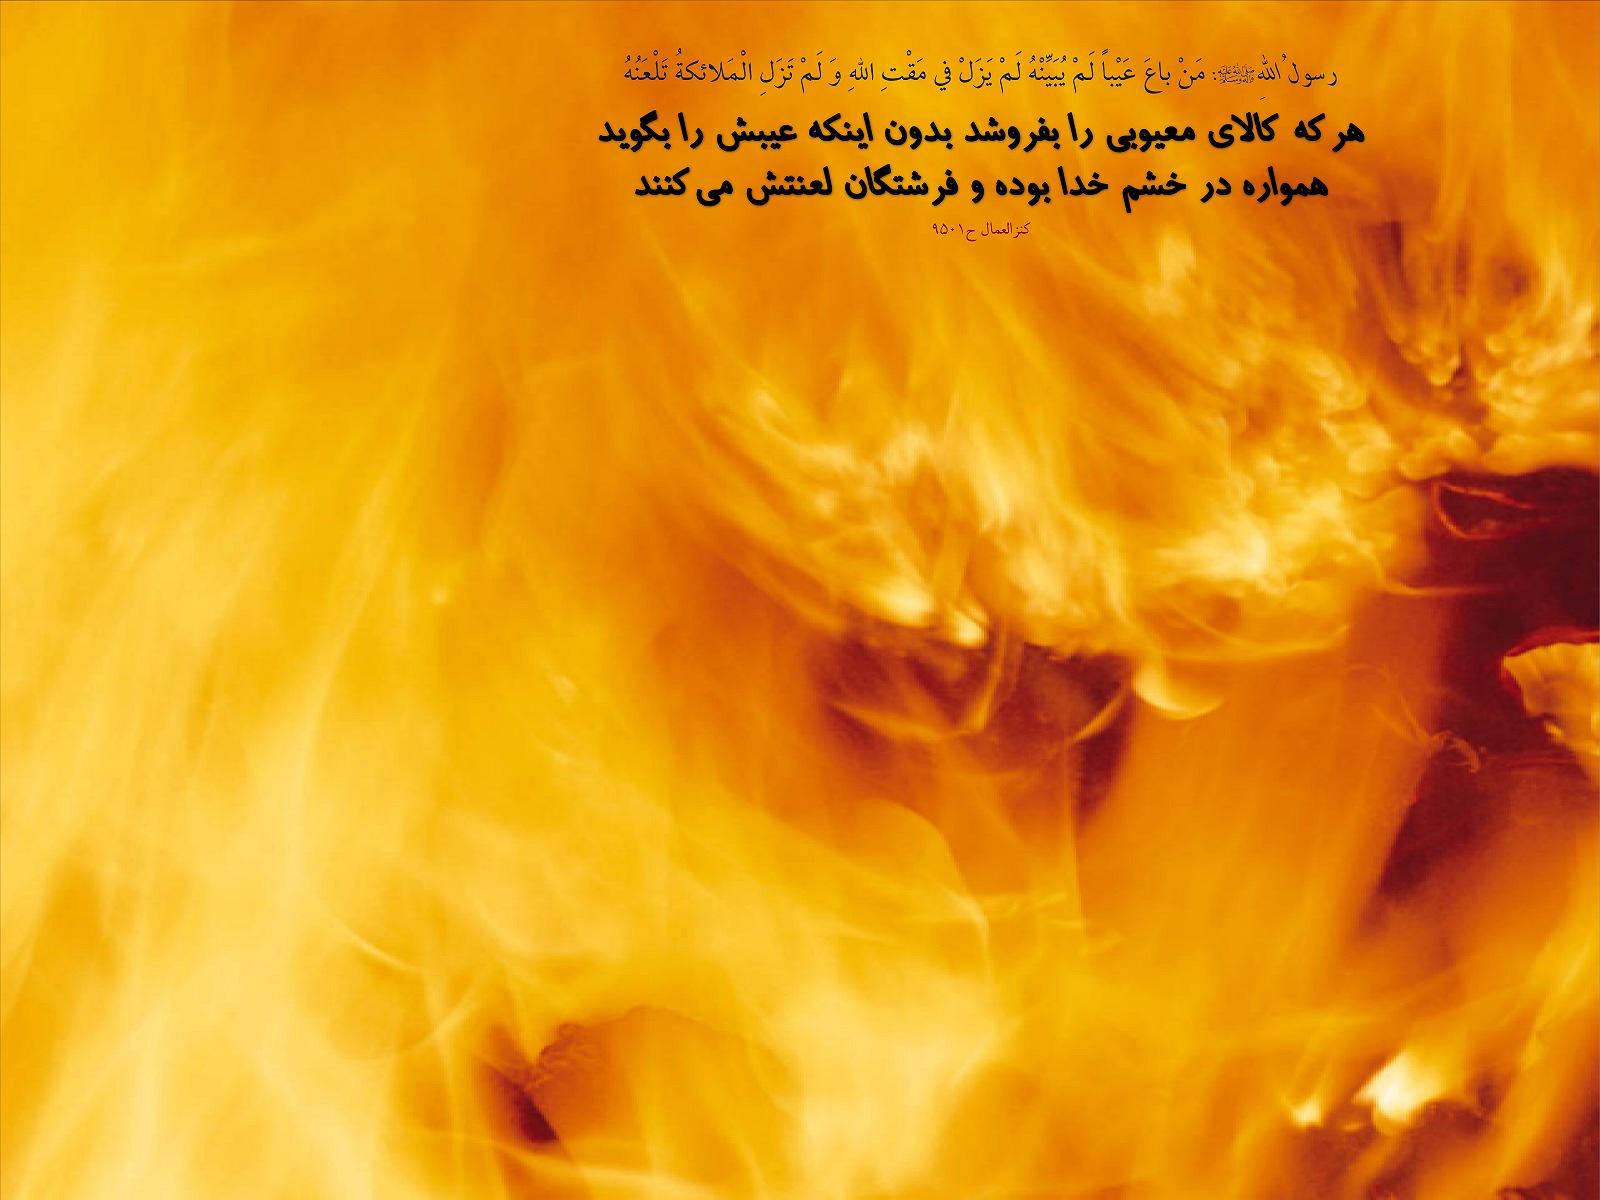 http://mhkh1972.gohardasht.com/uploaded/_303C380A-8092-411F-835B-B8A86E8CCB3B_.jpg